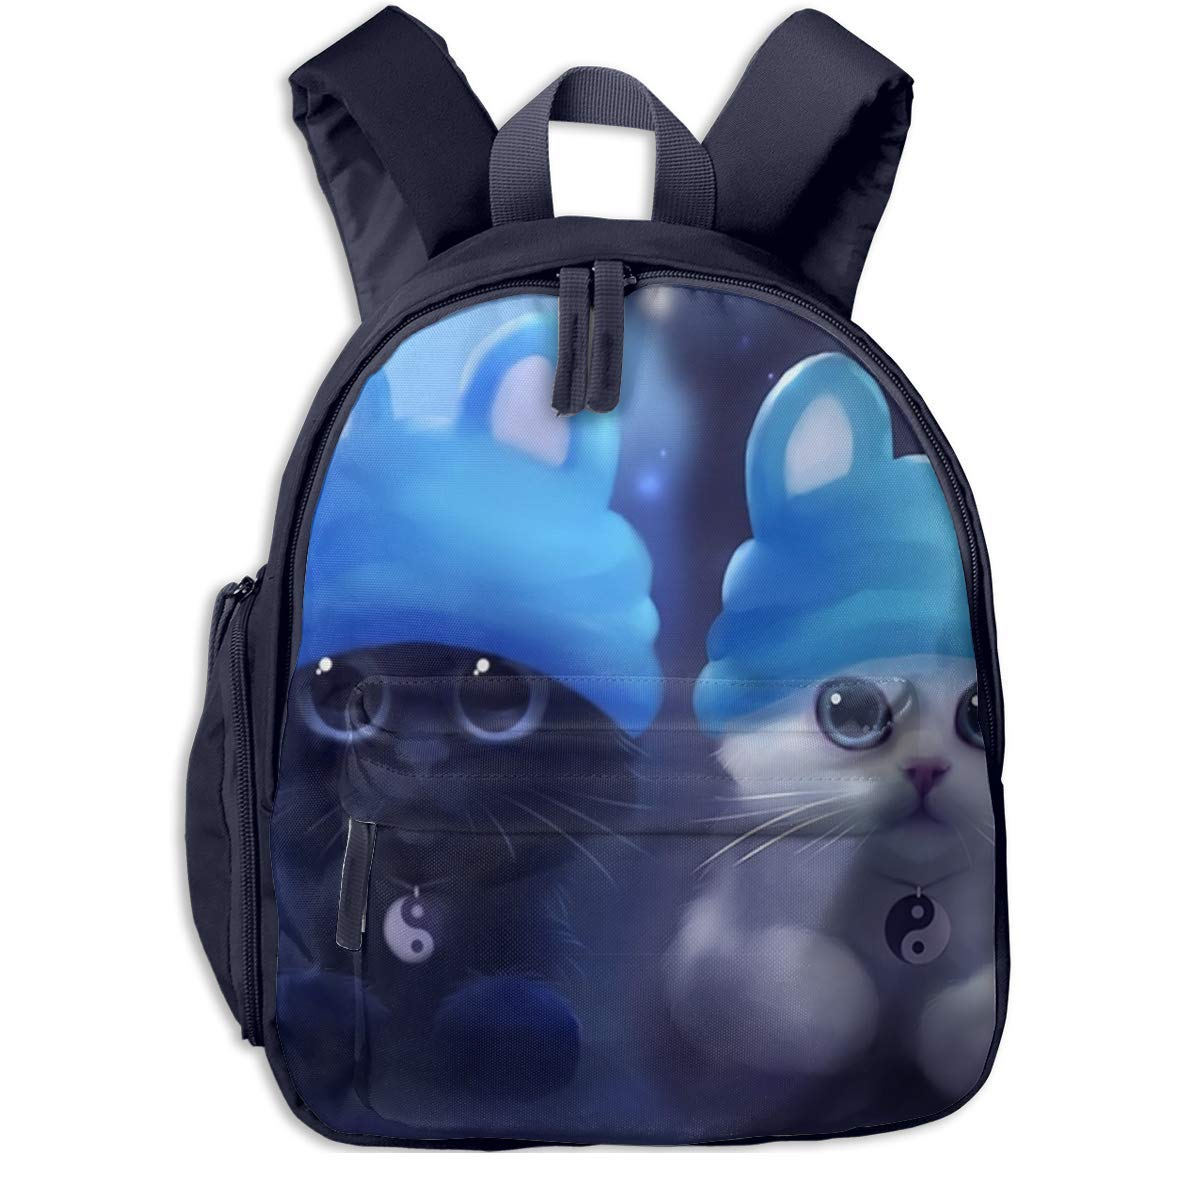 Sd4r5y3hg School Backpack for Girls Boys, Kids Cute Cute Cute schwarz and Weiß Cute Cat Cartoon Backpacks Book Bag B07M5NDDM5 Daypacks Diversifiziertes neues Design ee1529